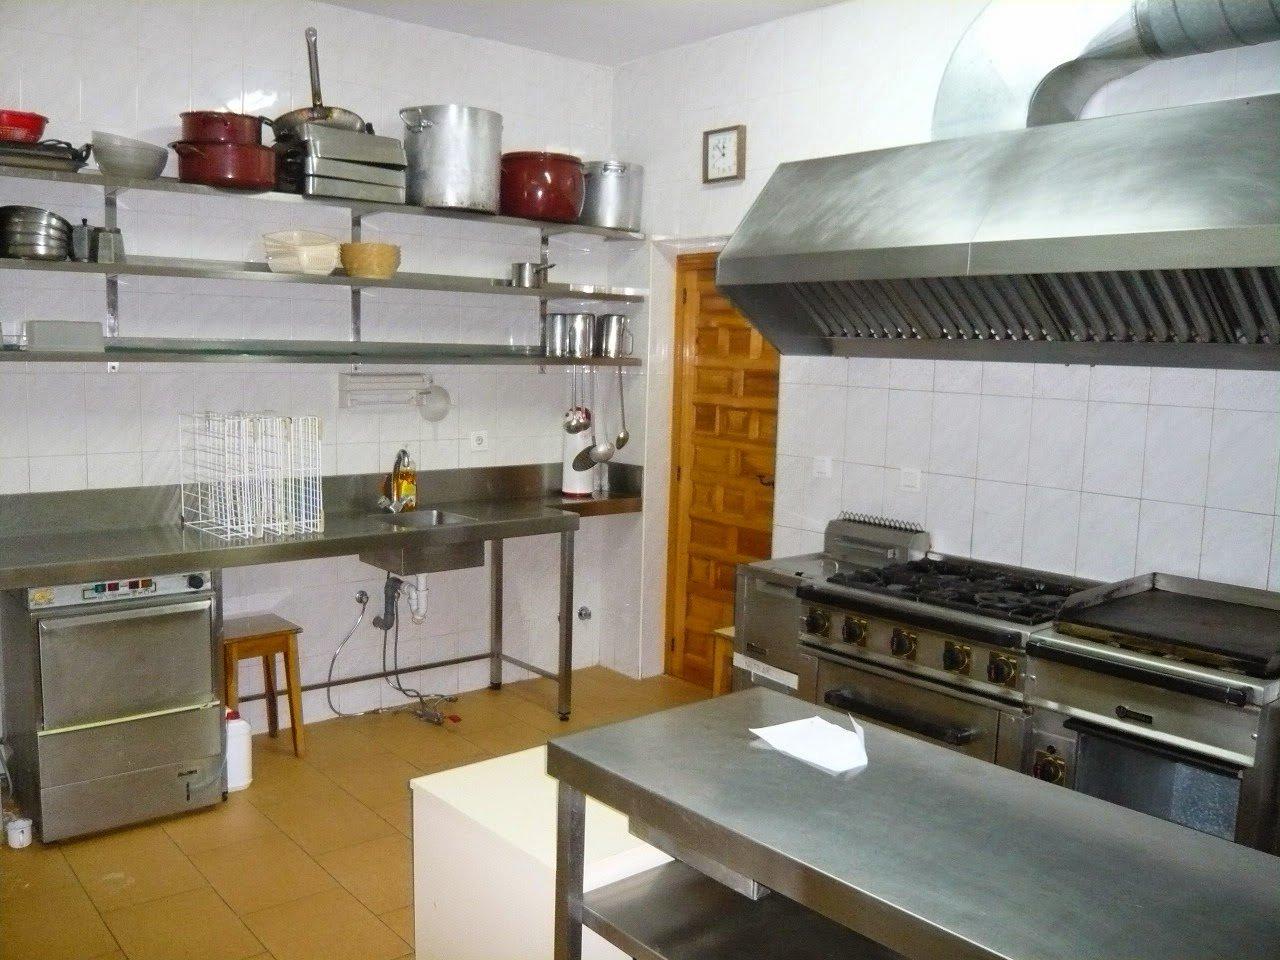 servcios albergue berzosa On cocina industrial equipada